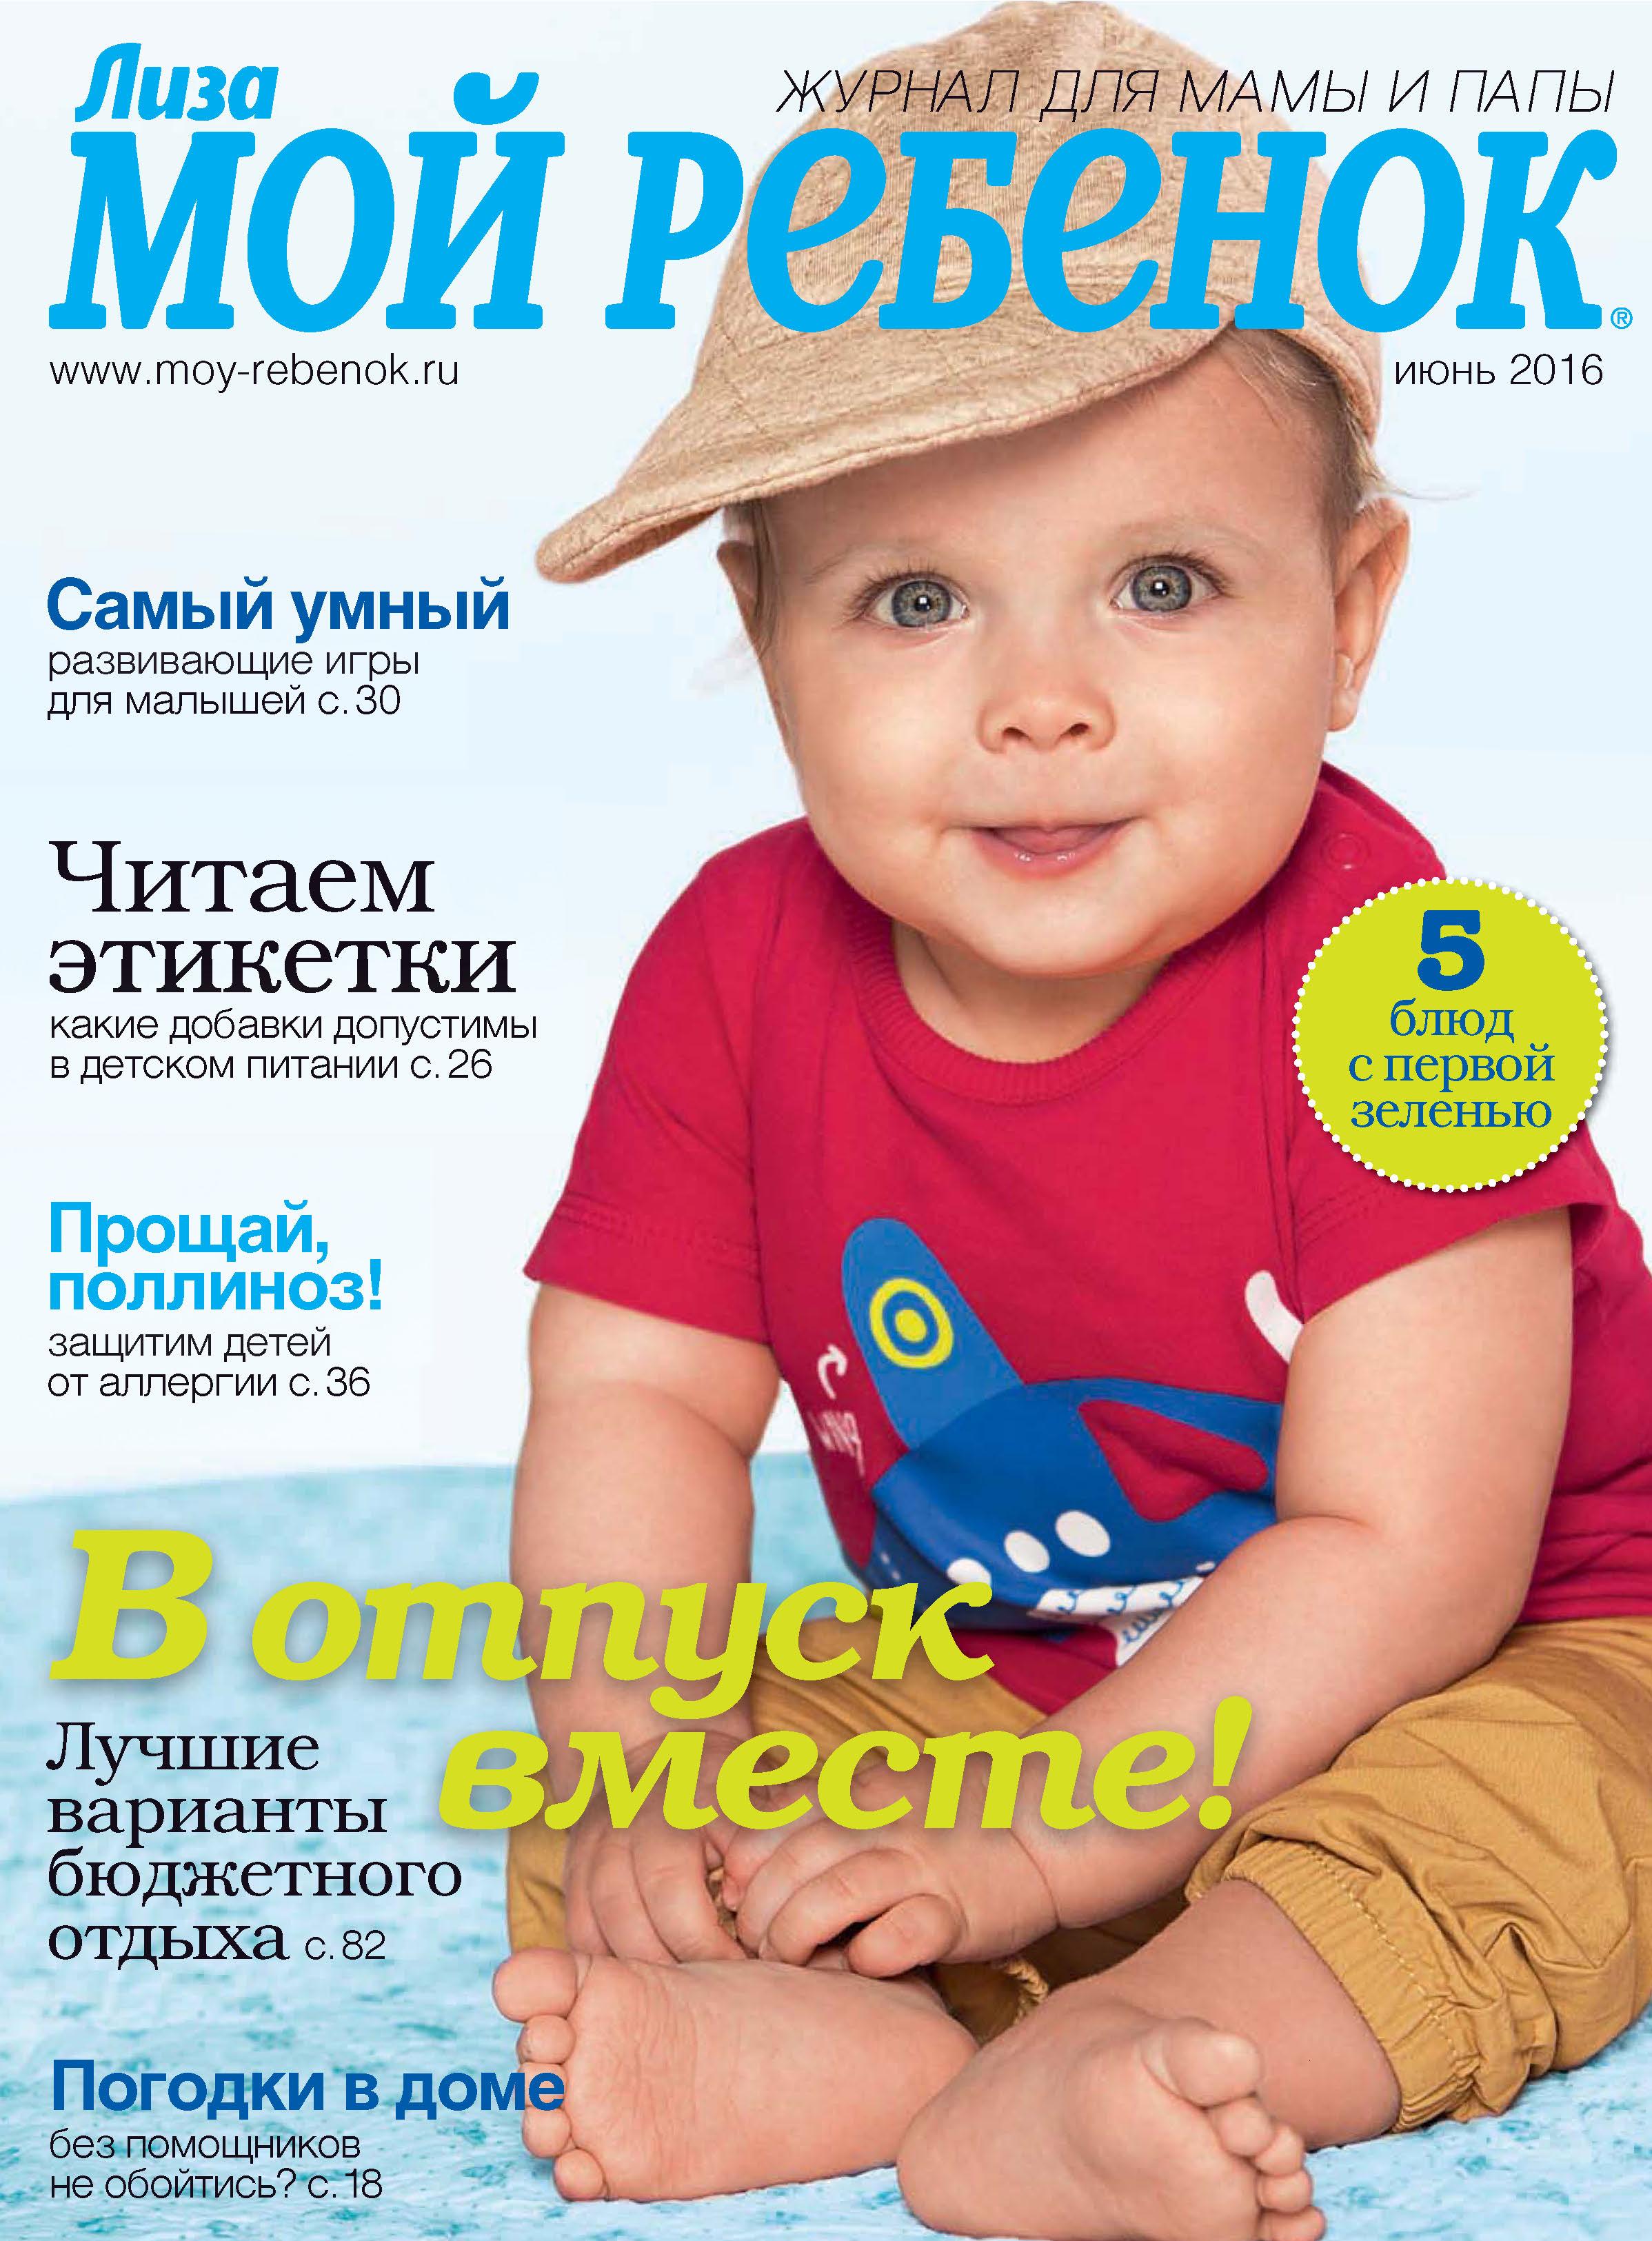 ИД «Бурда» Журнал «Лиза. Мой ребенок» №06/2016 ид бурда журнал лиза мой ребенок 09 2016